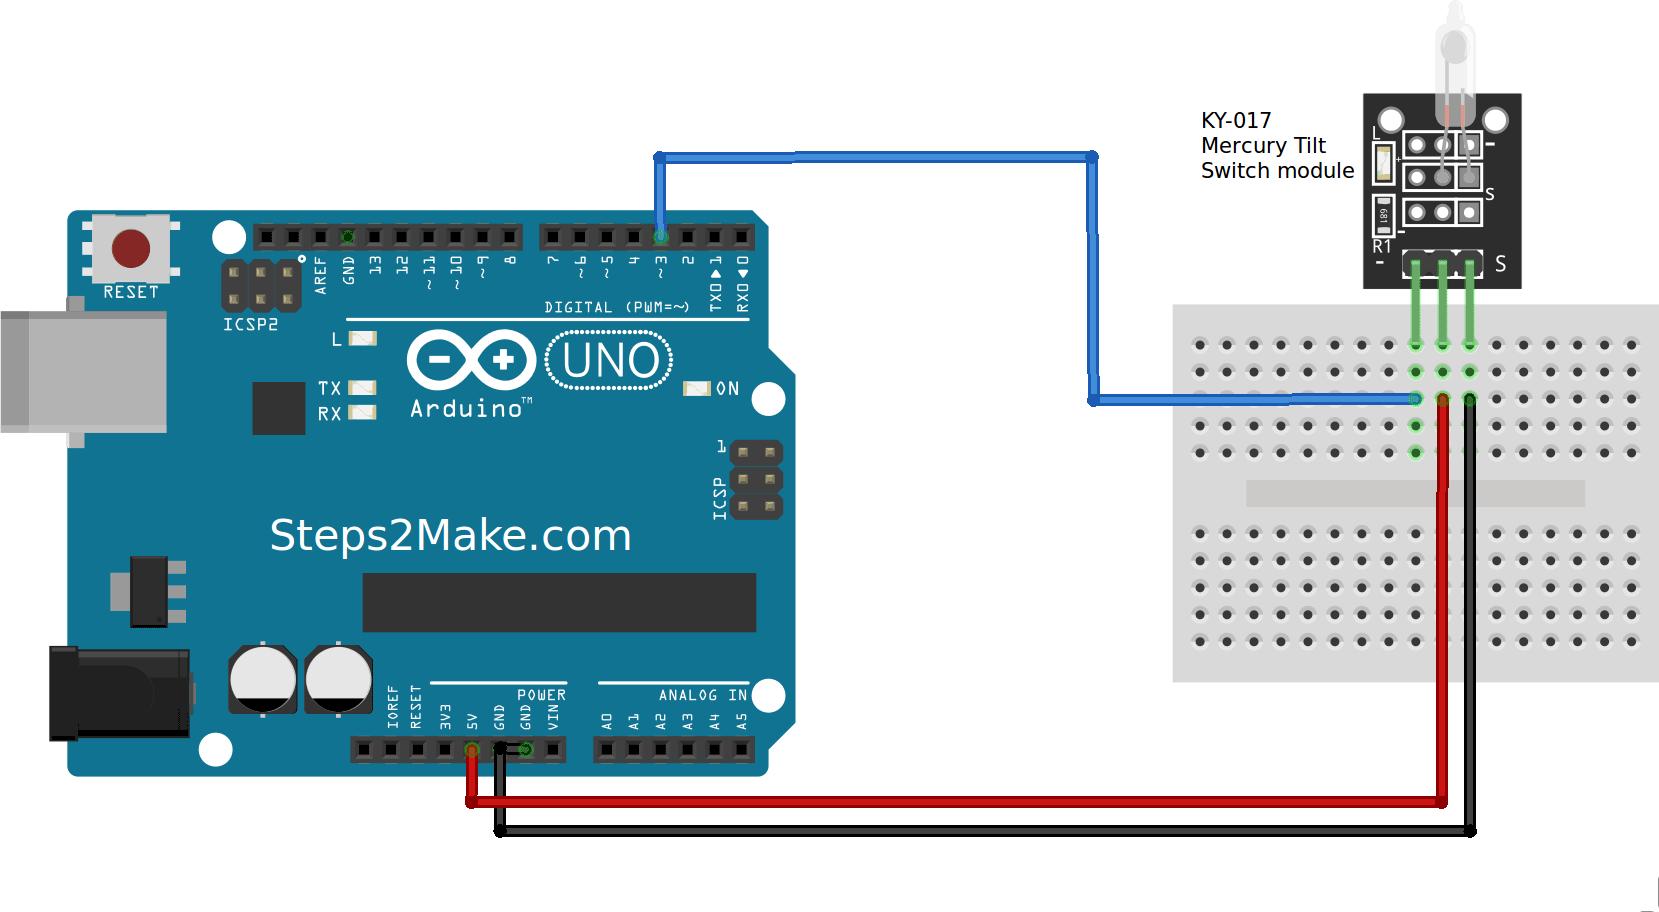 Arduino Mercury Tilt Switch Module Ky-017